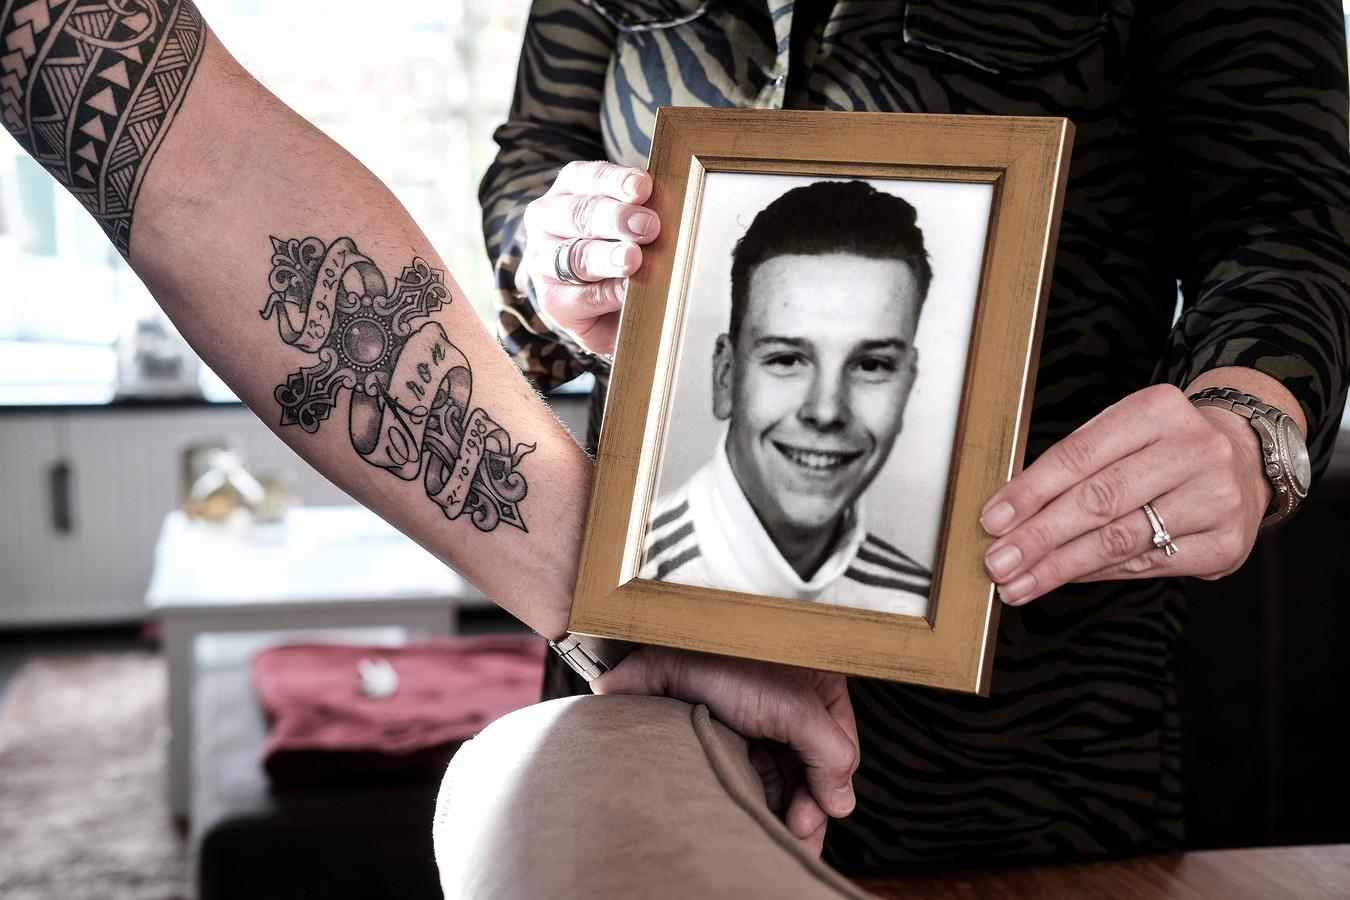 Extreem Tattoo troost intens verdrietige vader | Achterhoek | gelderlander.nl @PB04